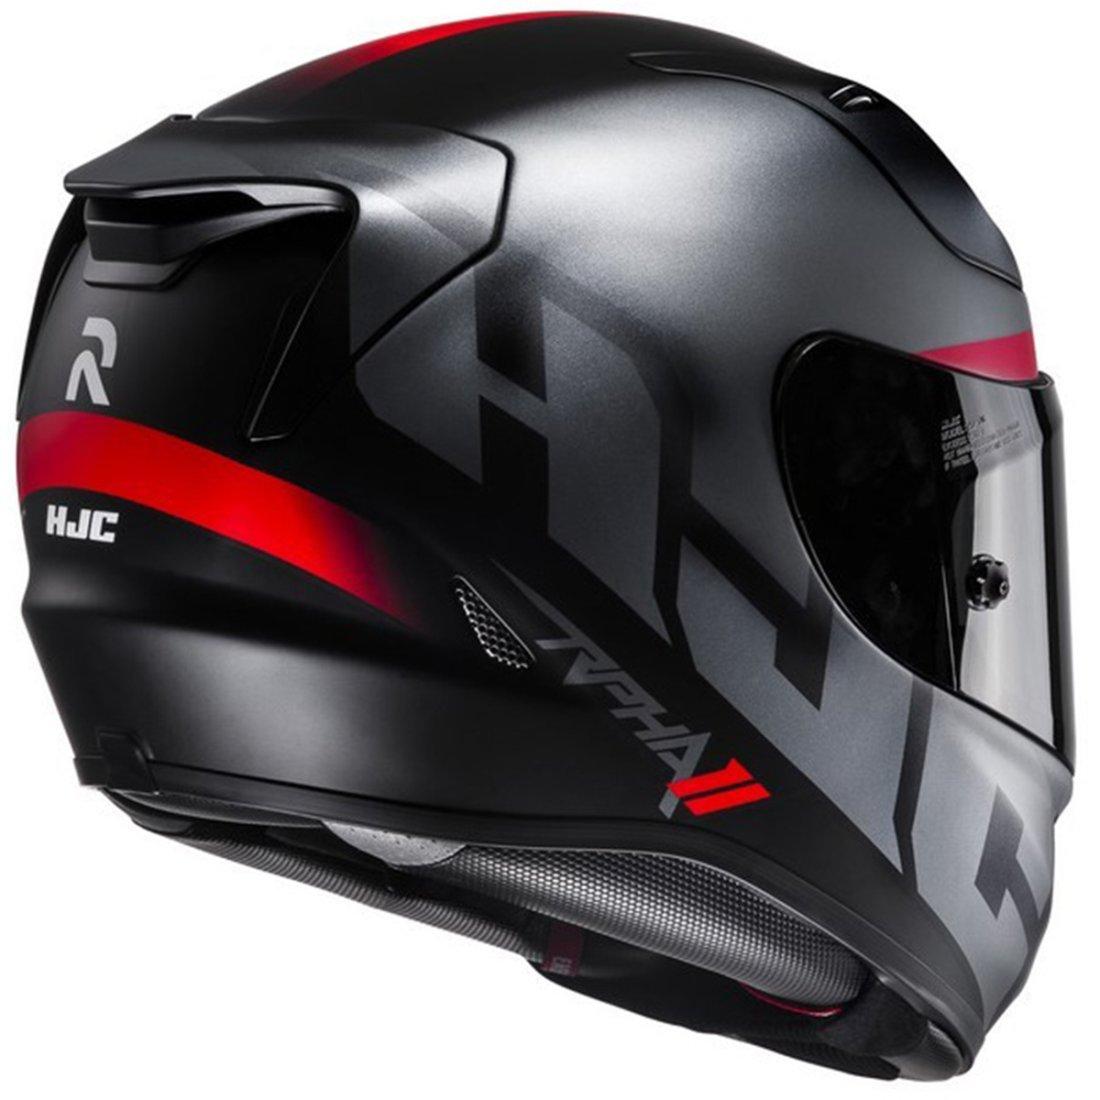 hjc rpha 11 spicho mc 5sf helmet motocard. Black Bedroom Furniture Sets. Home Design Ideas